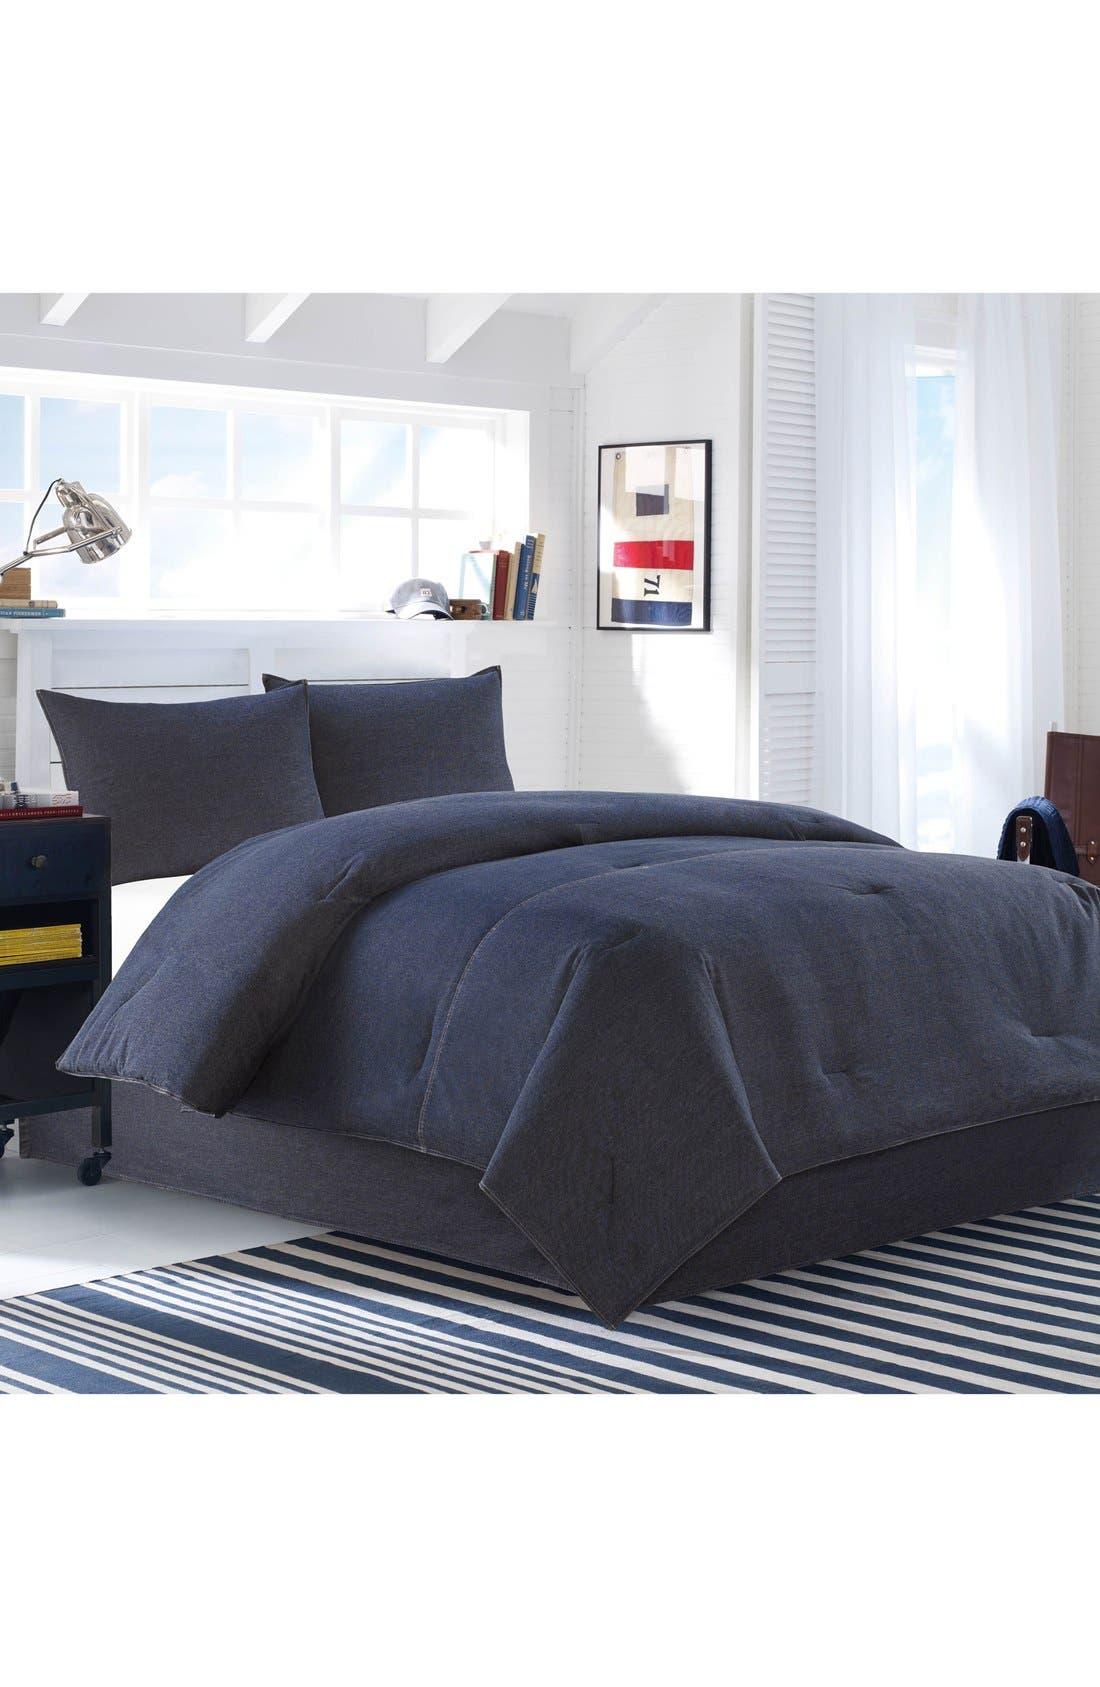 NAUTICA Seaward Comforter & Sham Set, Main, color, DENIM BLUE